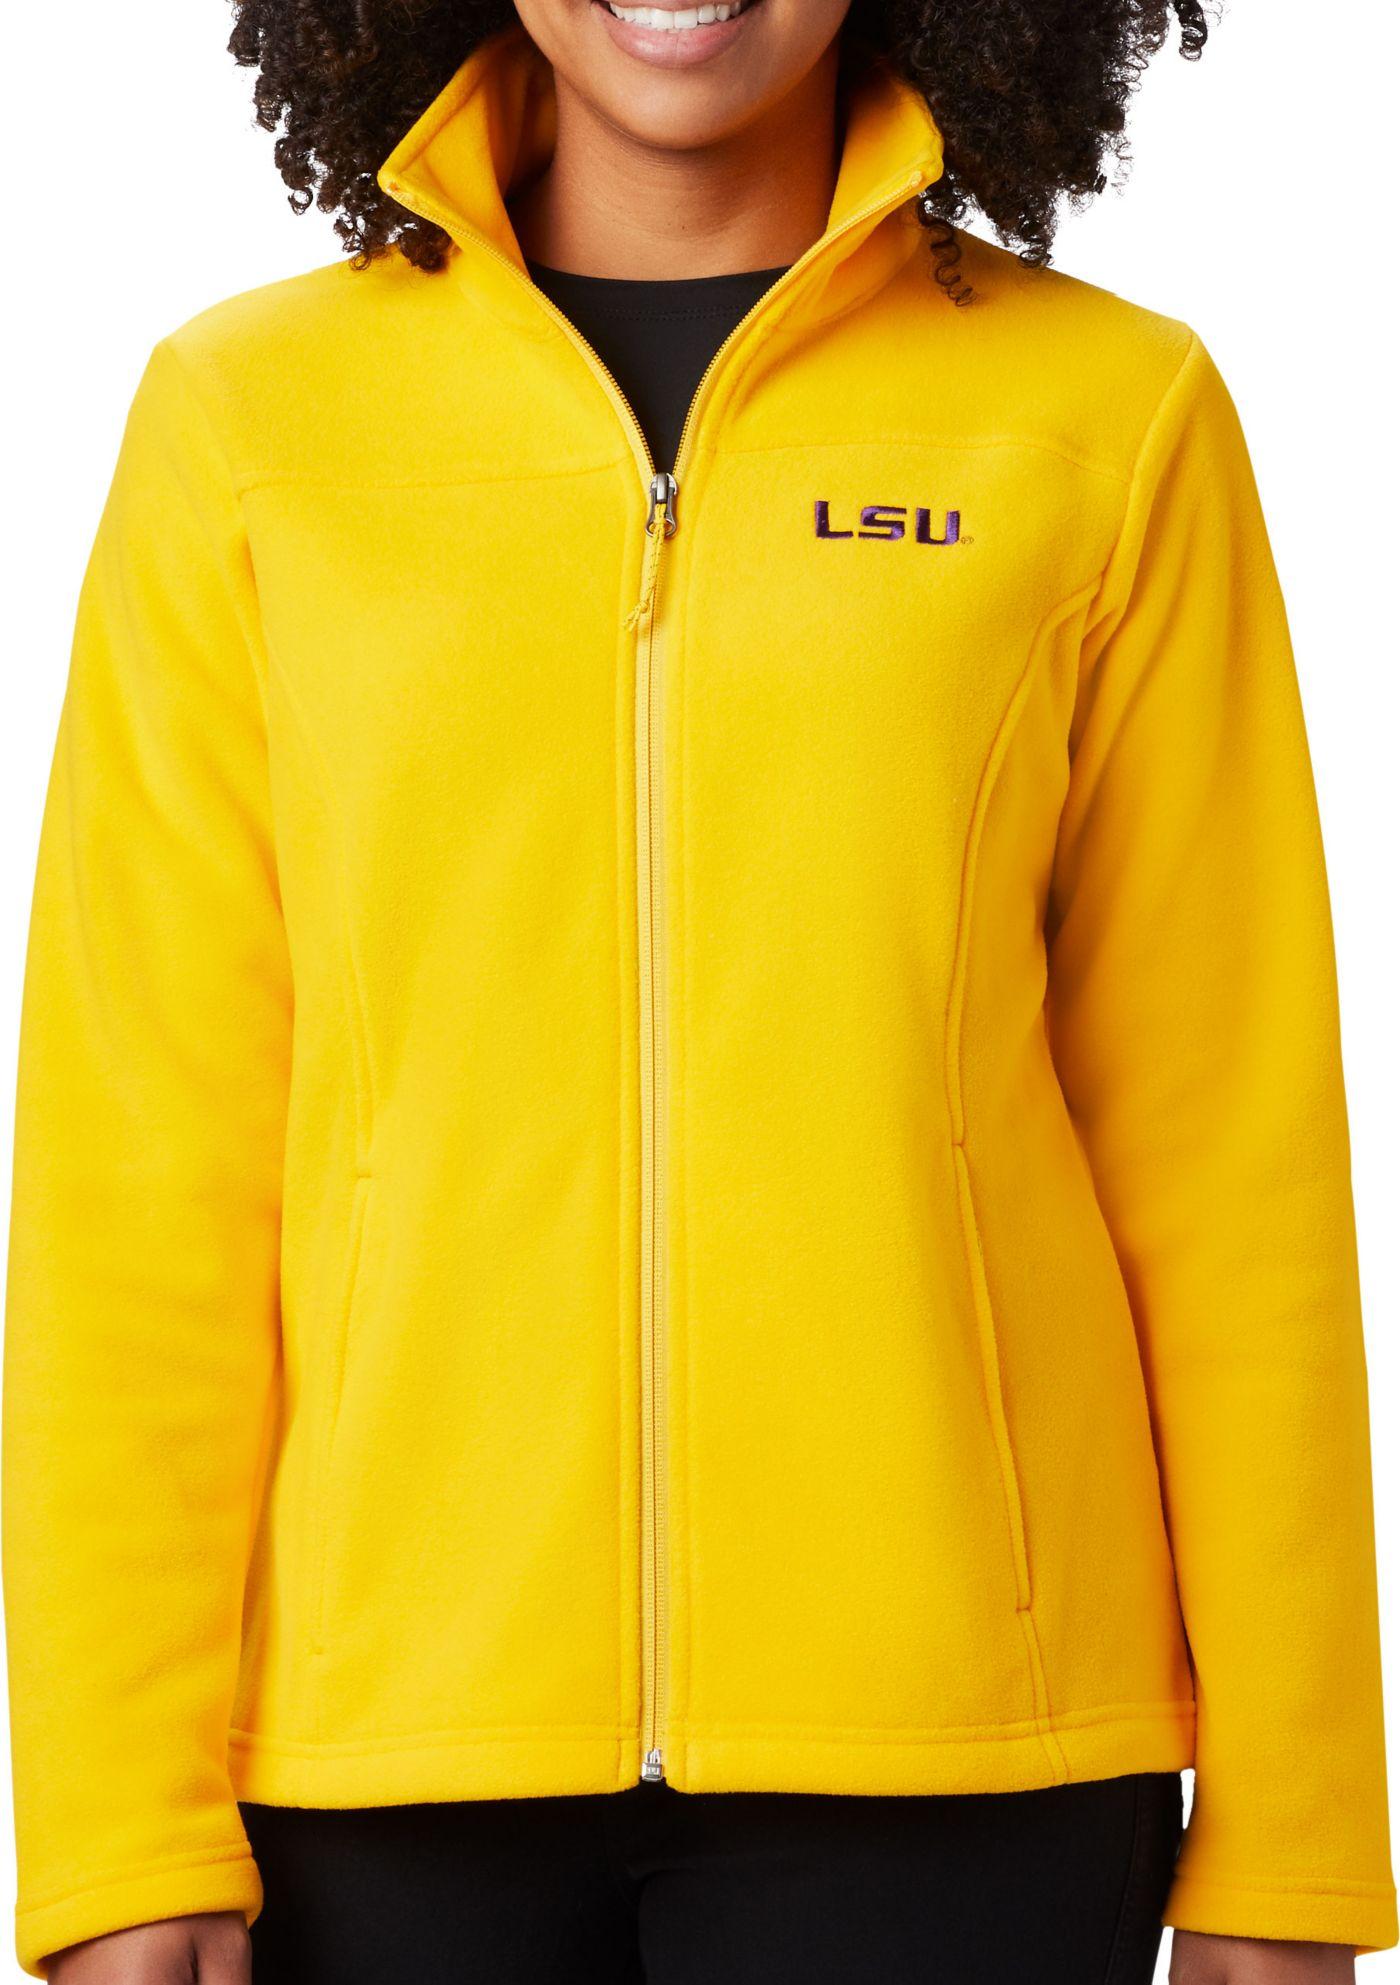 Columbia Women's LSU Tigers Gold Give & Go Full-Zip Jacket